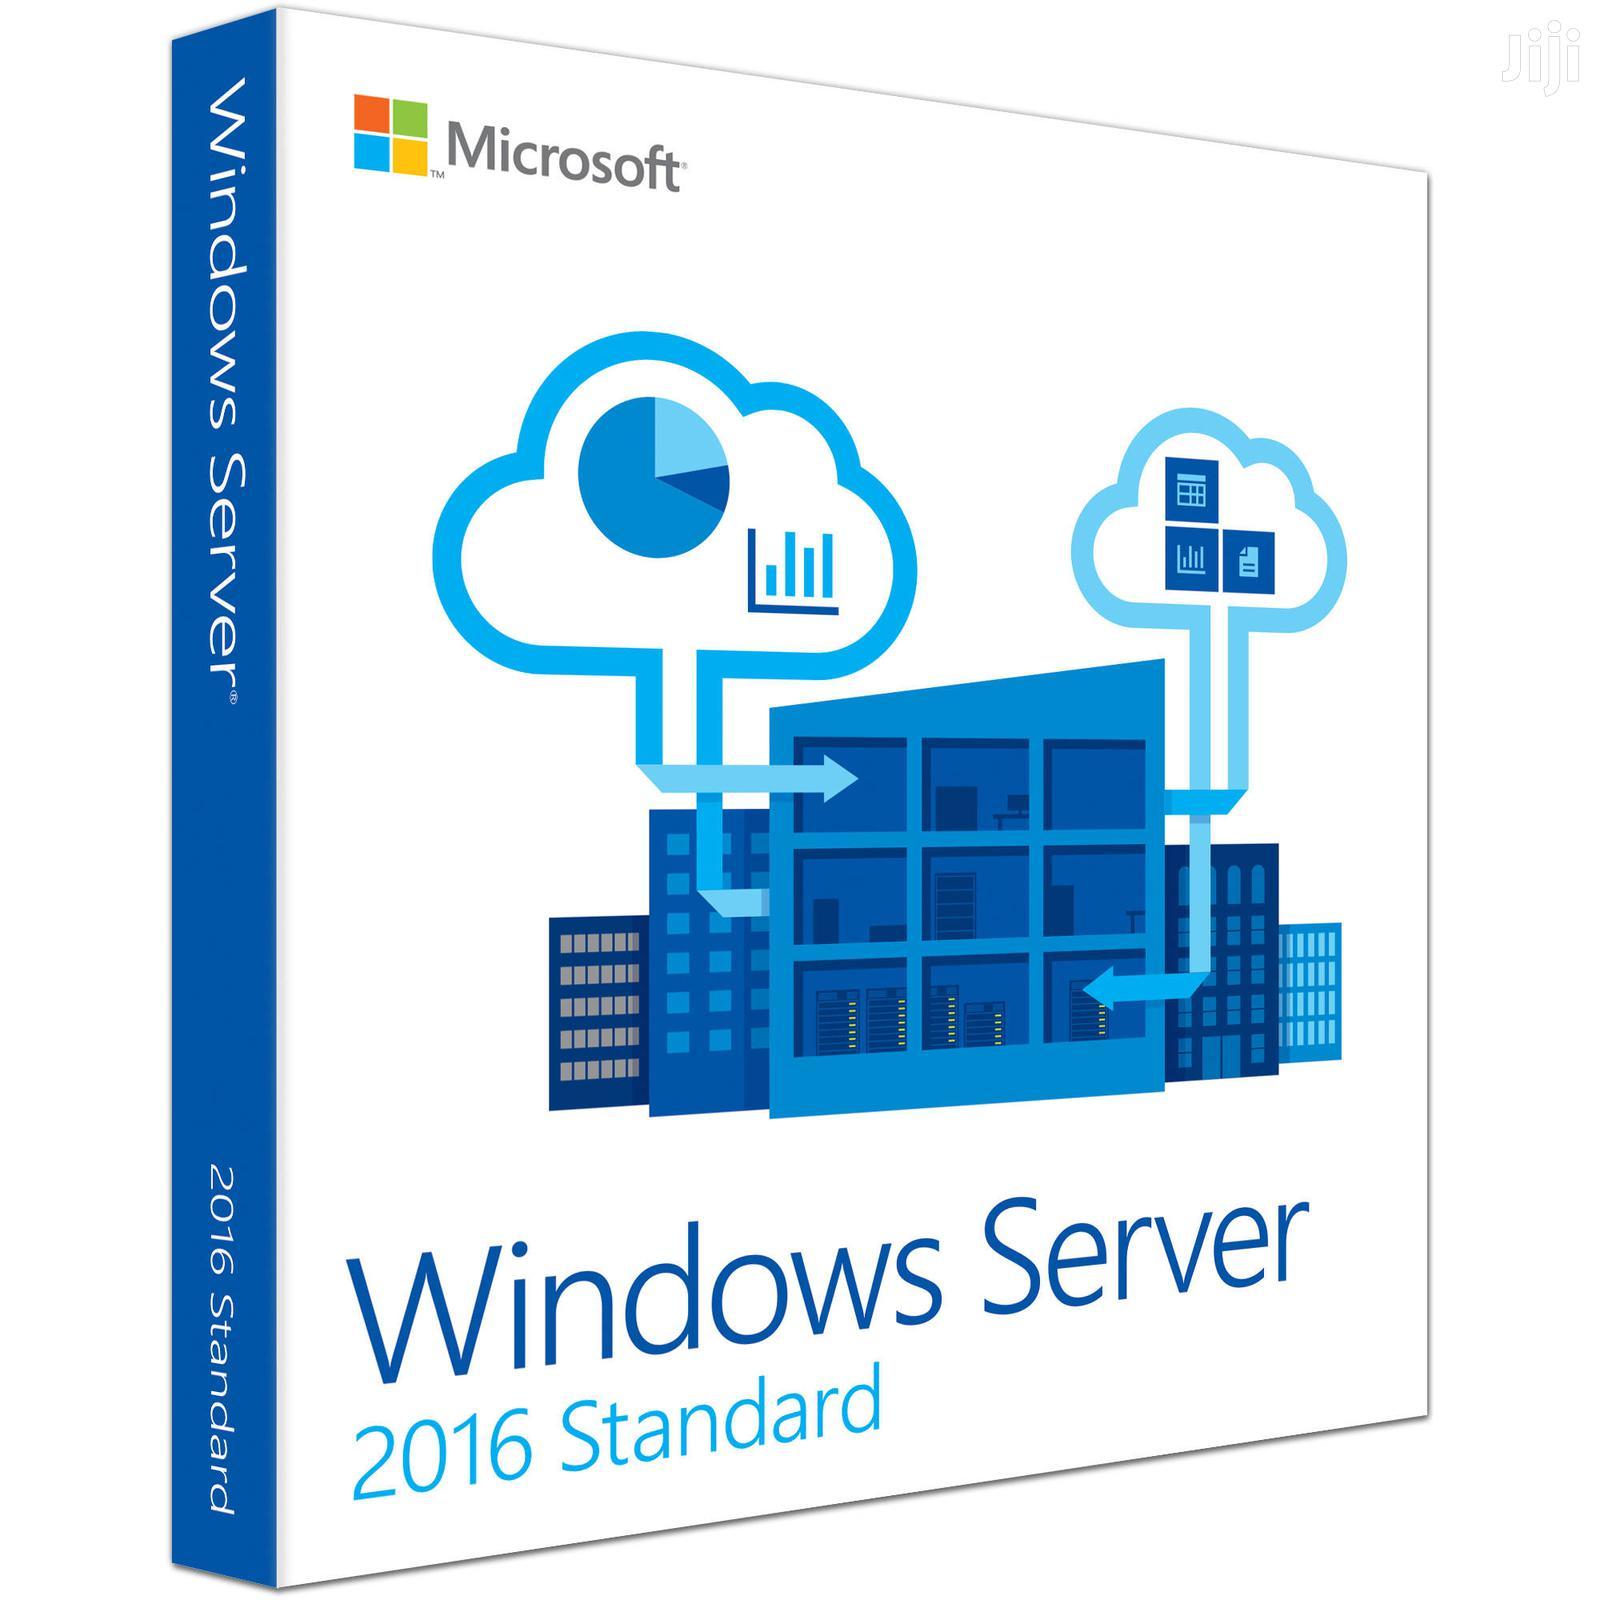 Windows Server 2016 Licenses